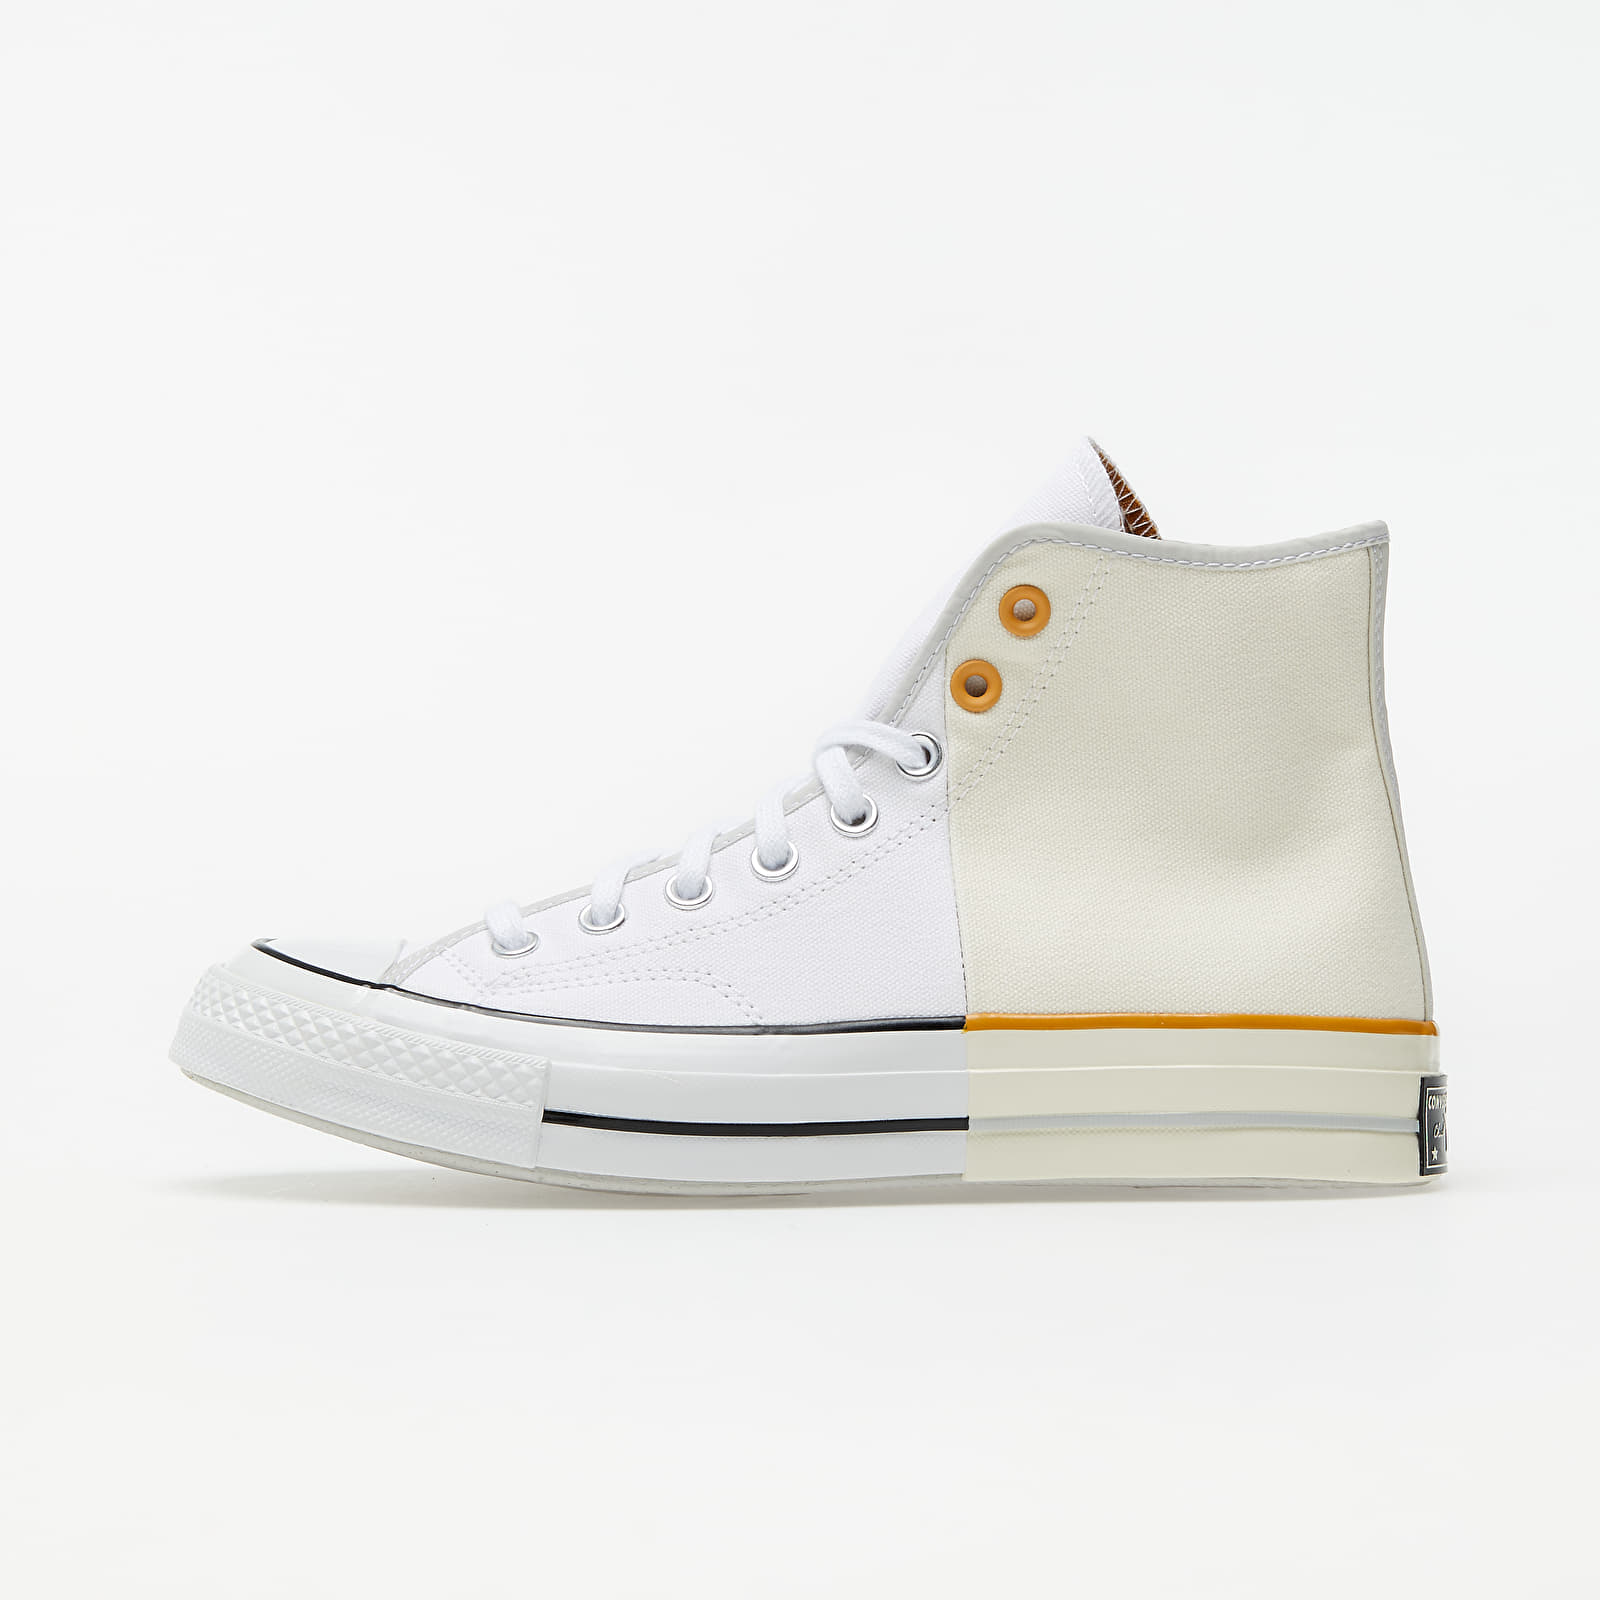 Converse Chuck 70 Optical White 167669C